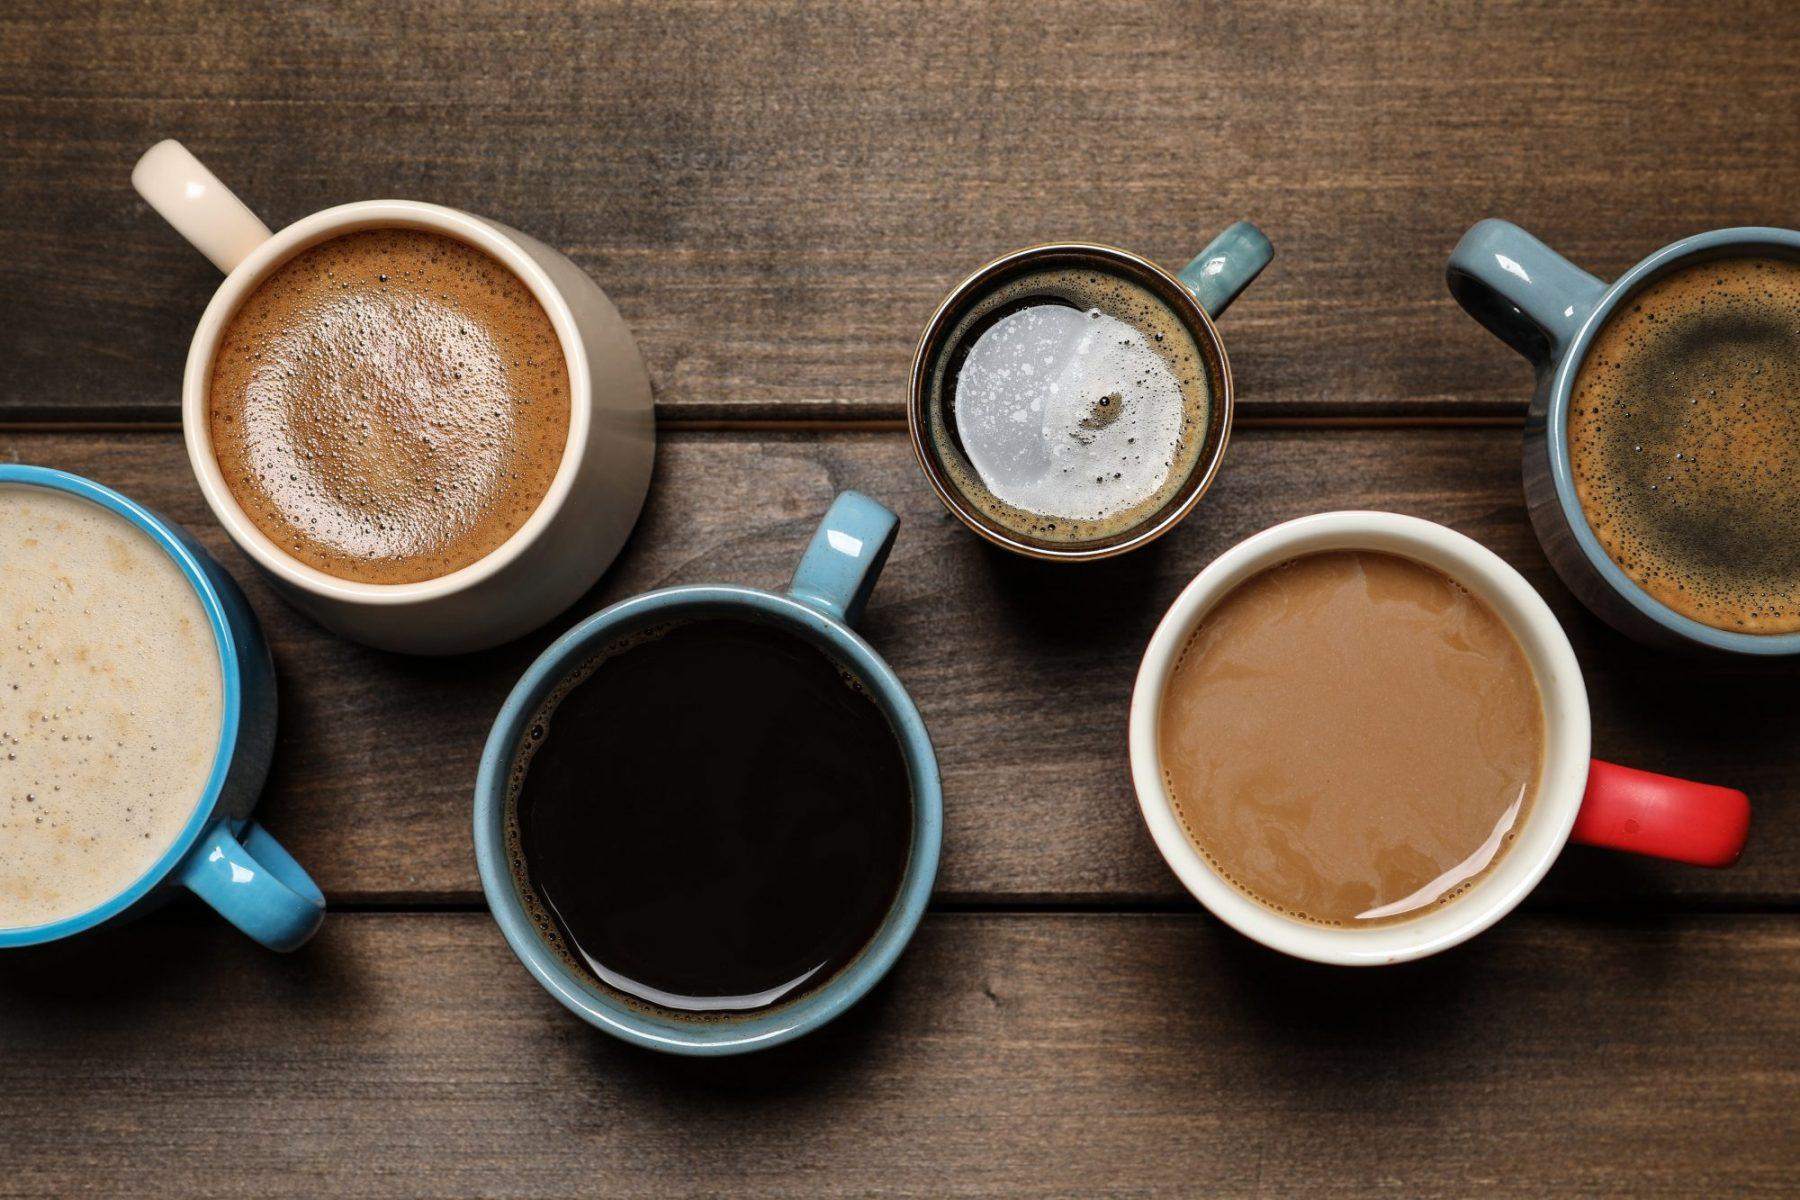 Nashville Coffee Equipment | Brew Coffee | Single-Cup Coffee Service